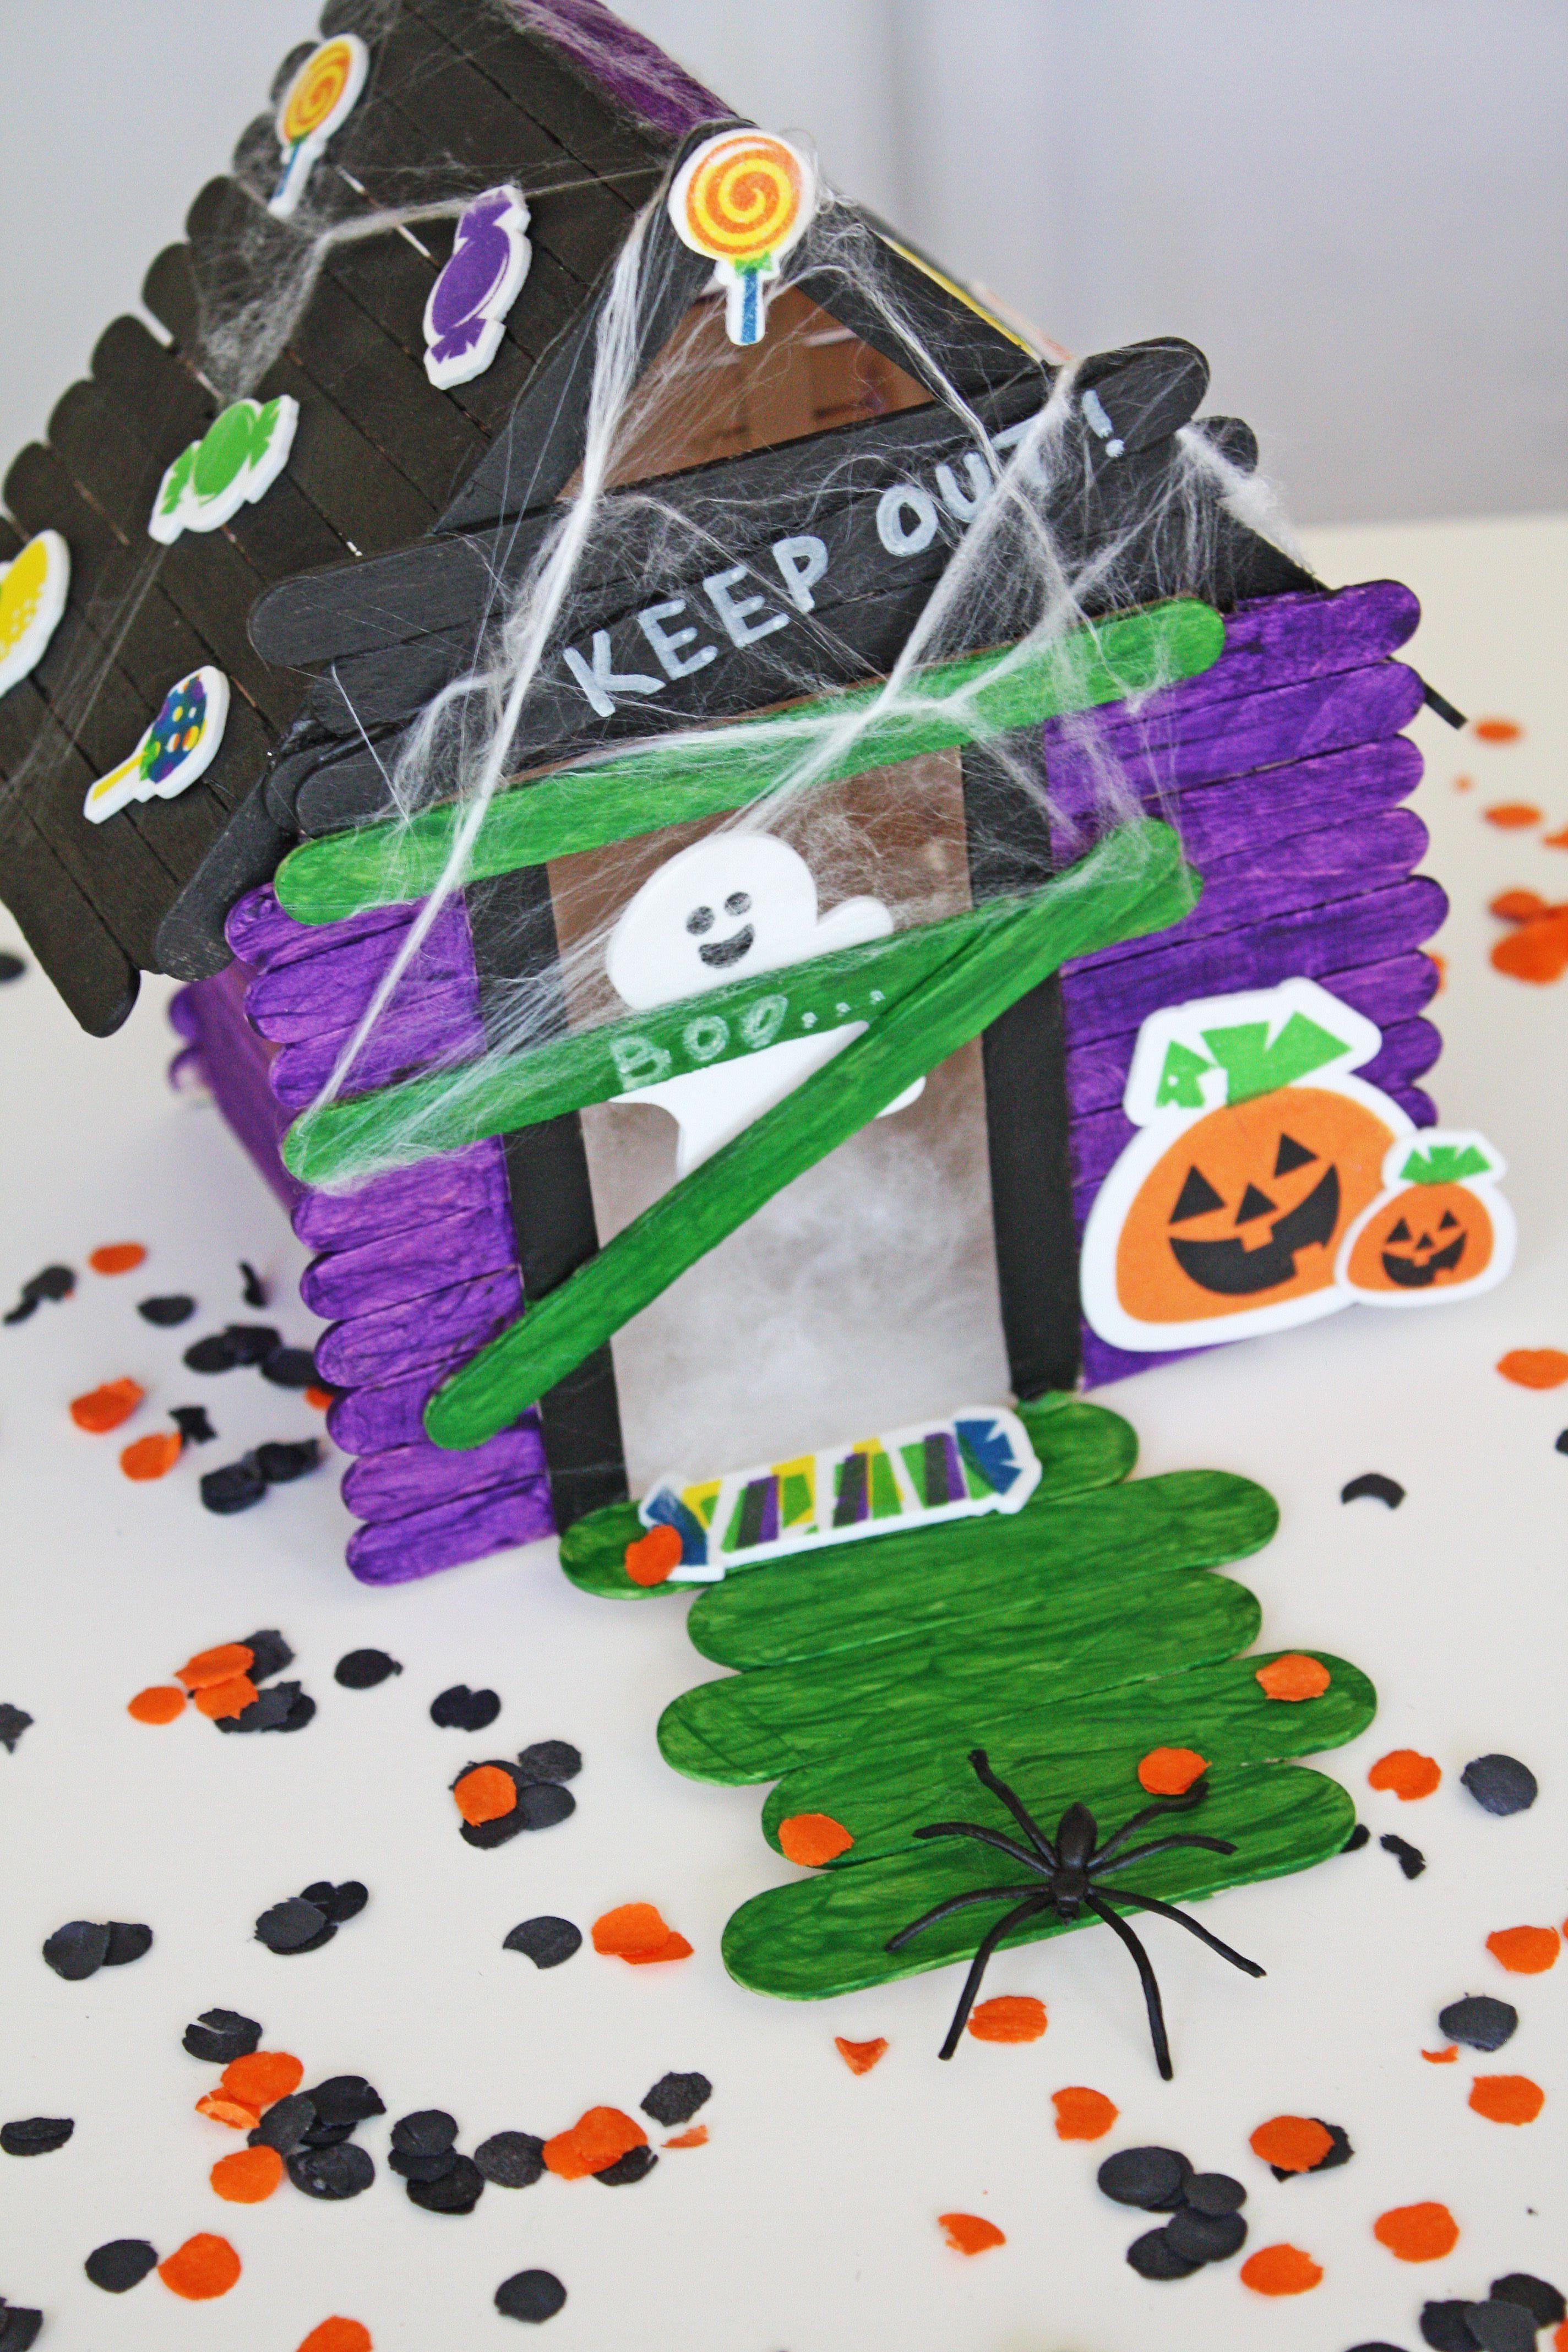 49+ Popsicle stick halloween craft ideas information